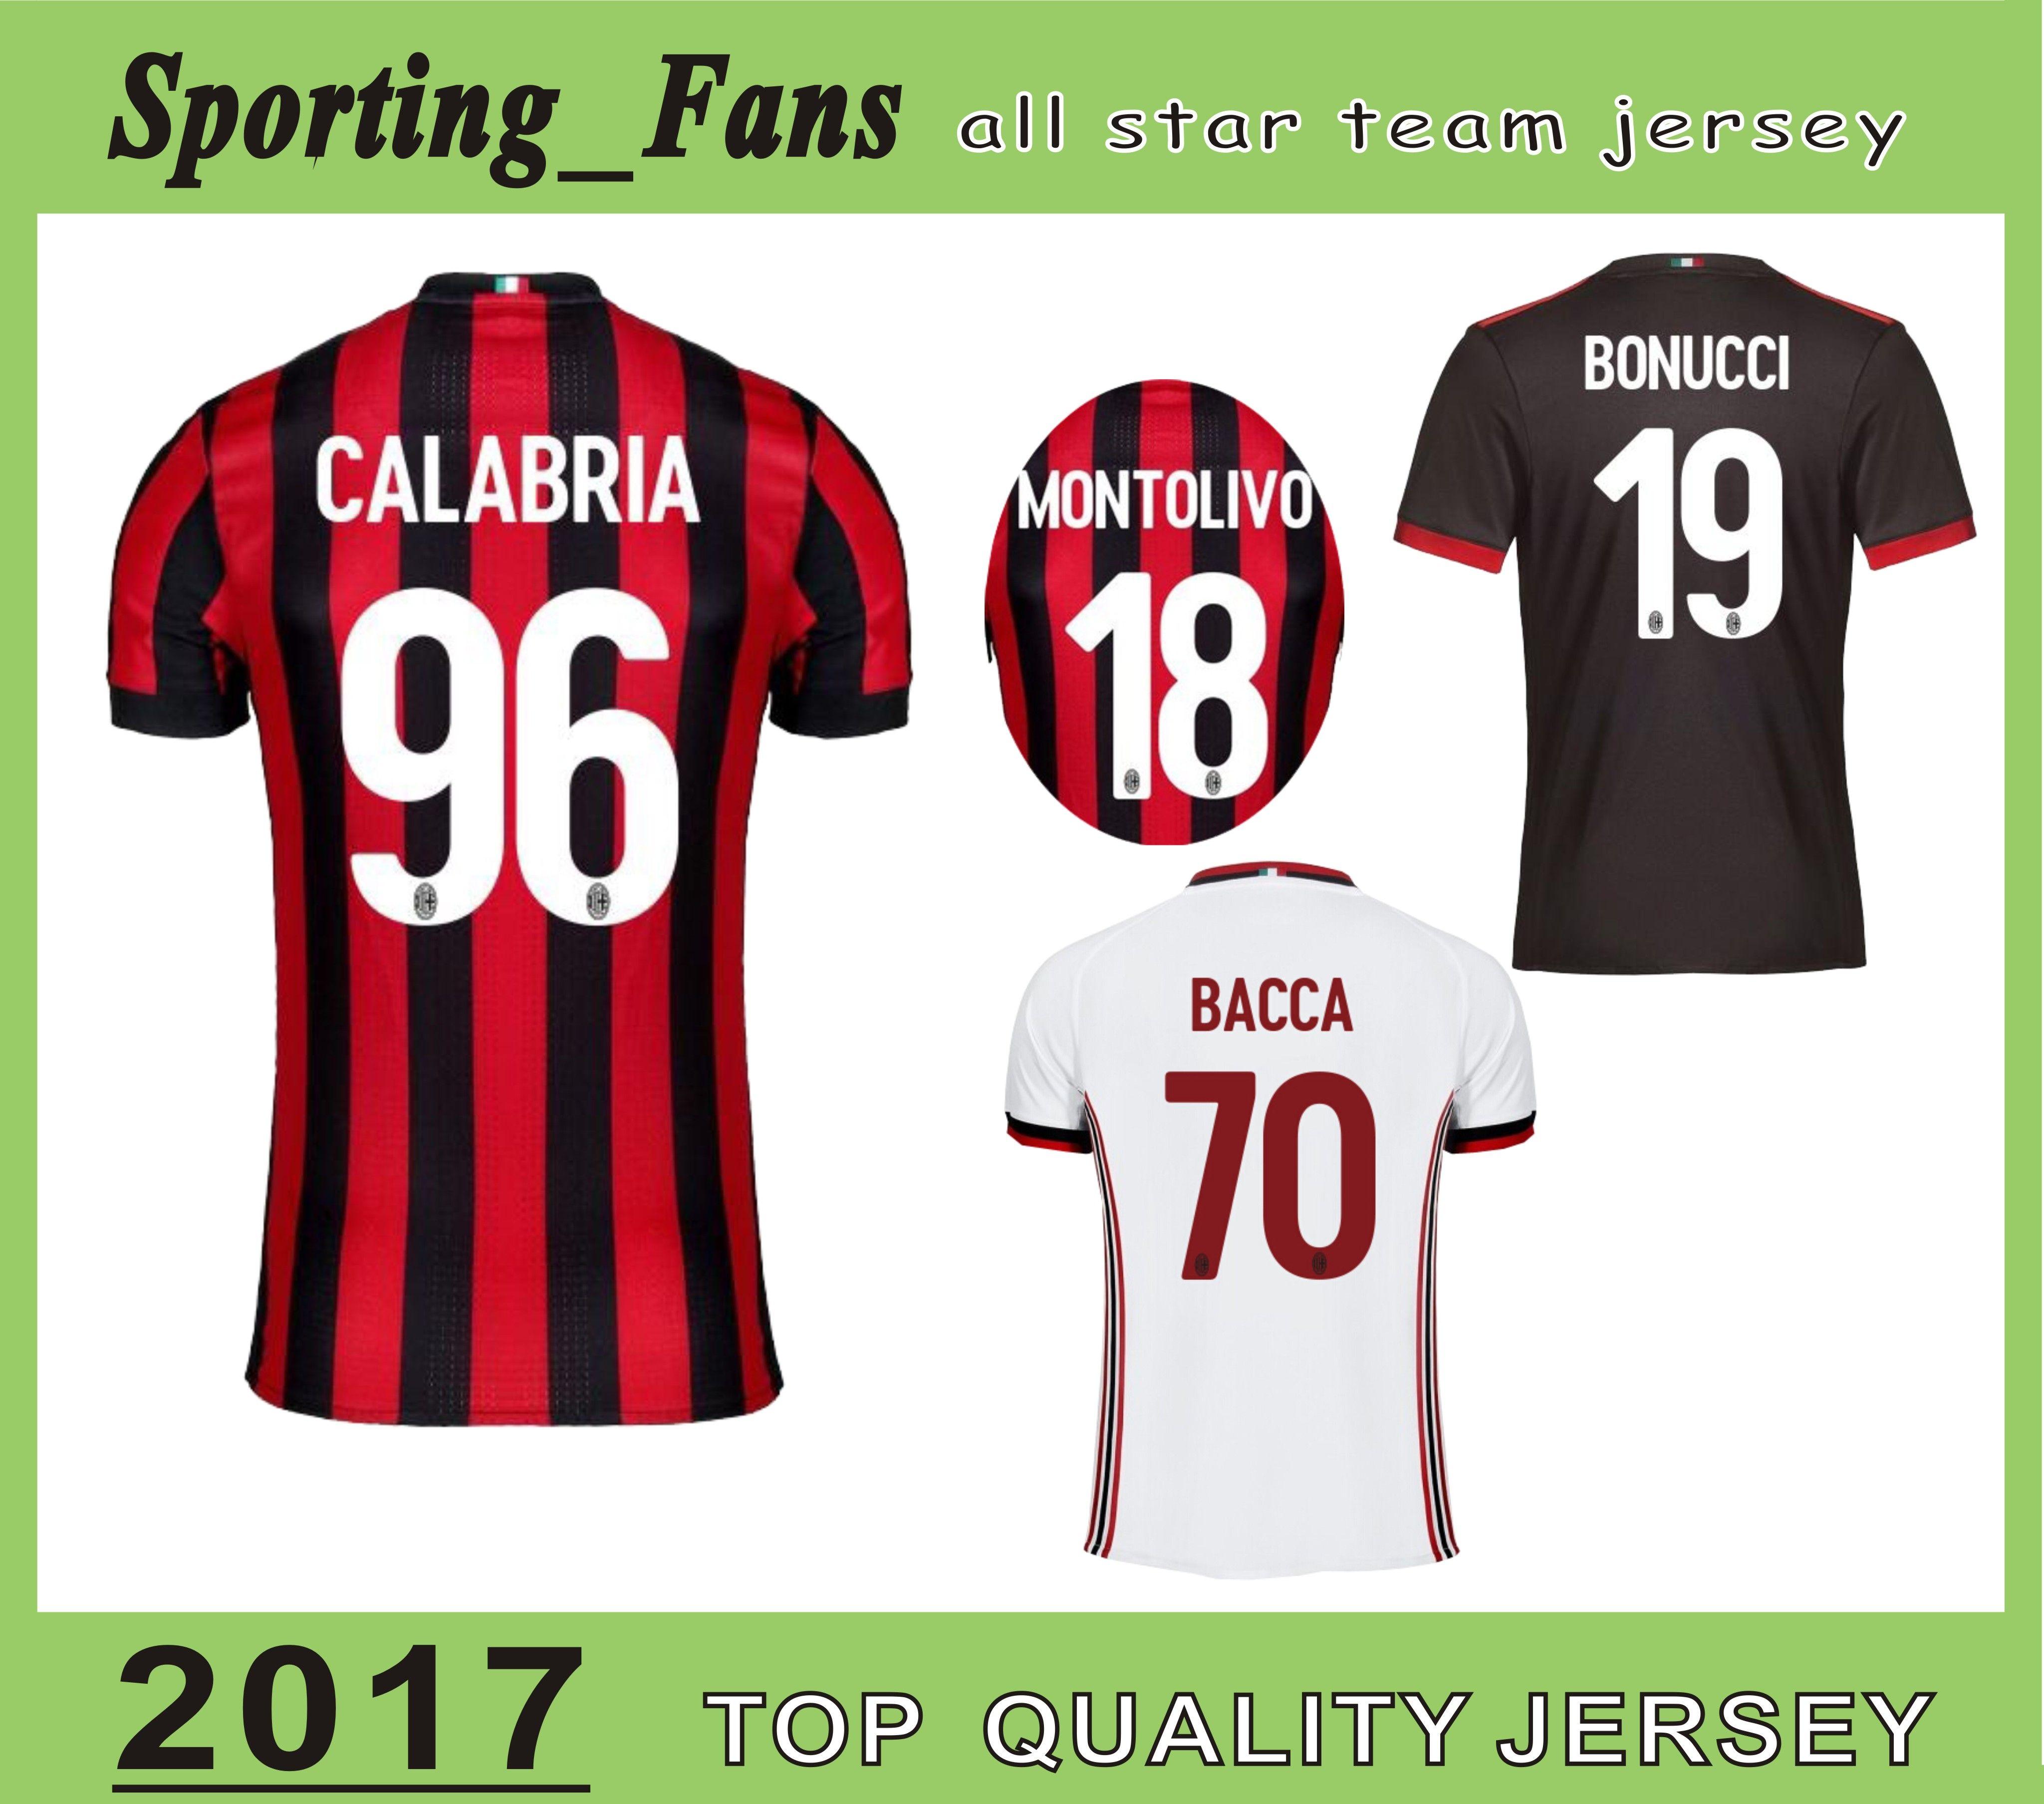 2019 Big Size S 4XL17 18 BACCA Soccer Jerseys MONOTOLIVO Football Tshirt DE  SCIGLIO Bonaventura POLI Suso LAPADULA Calabria Camisa Jersey From  Sporting fans ... c0861e289